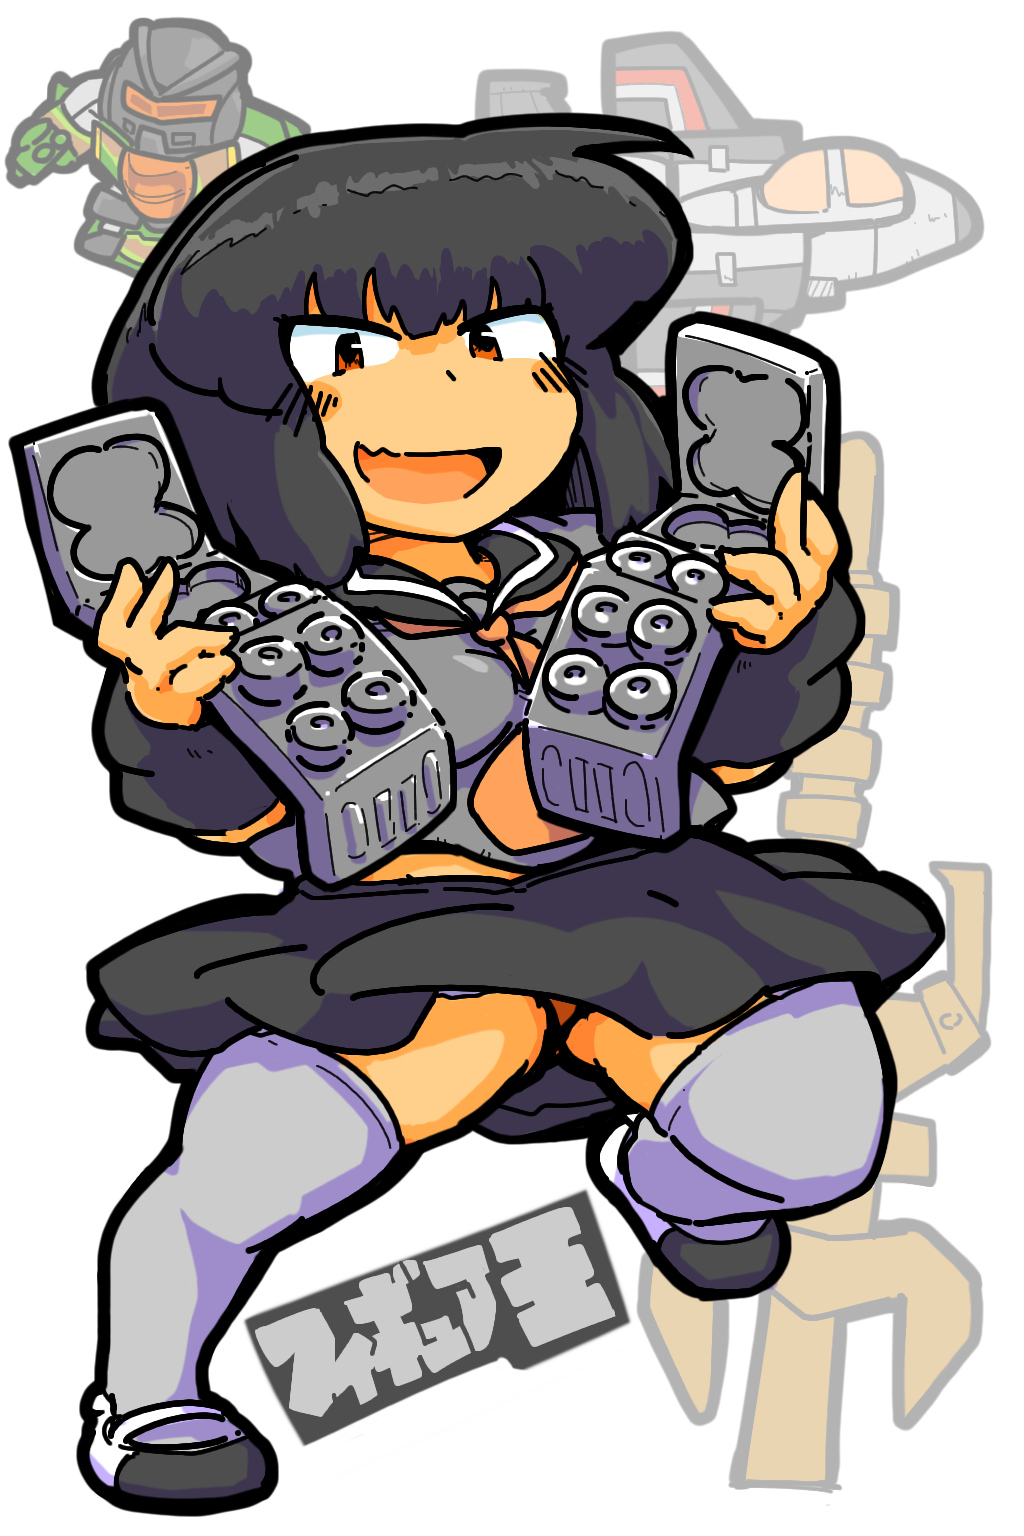 transformers generation1 Limited Black Version starscream pretenders humanized gijinka robot girl Holomatter Avatars robotmasters takara